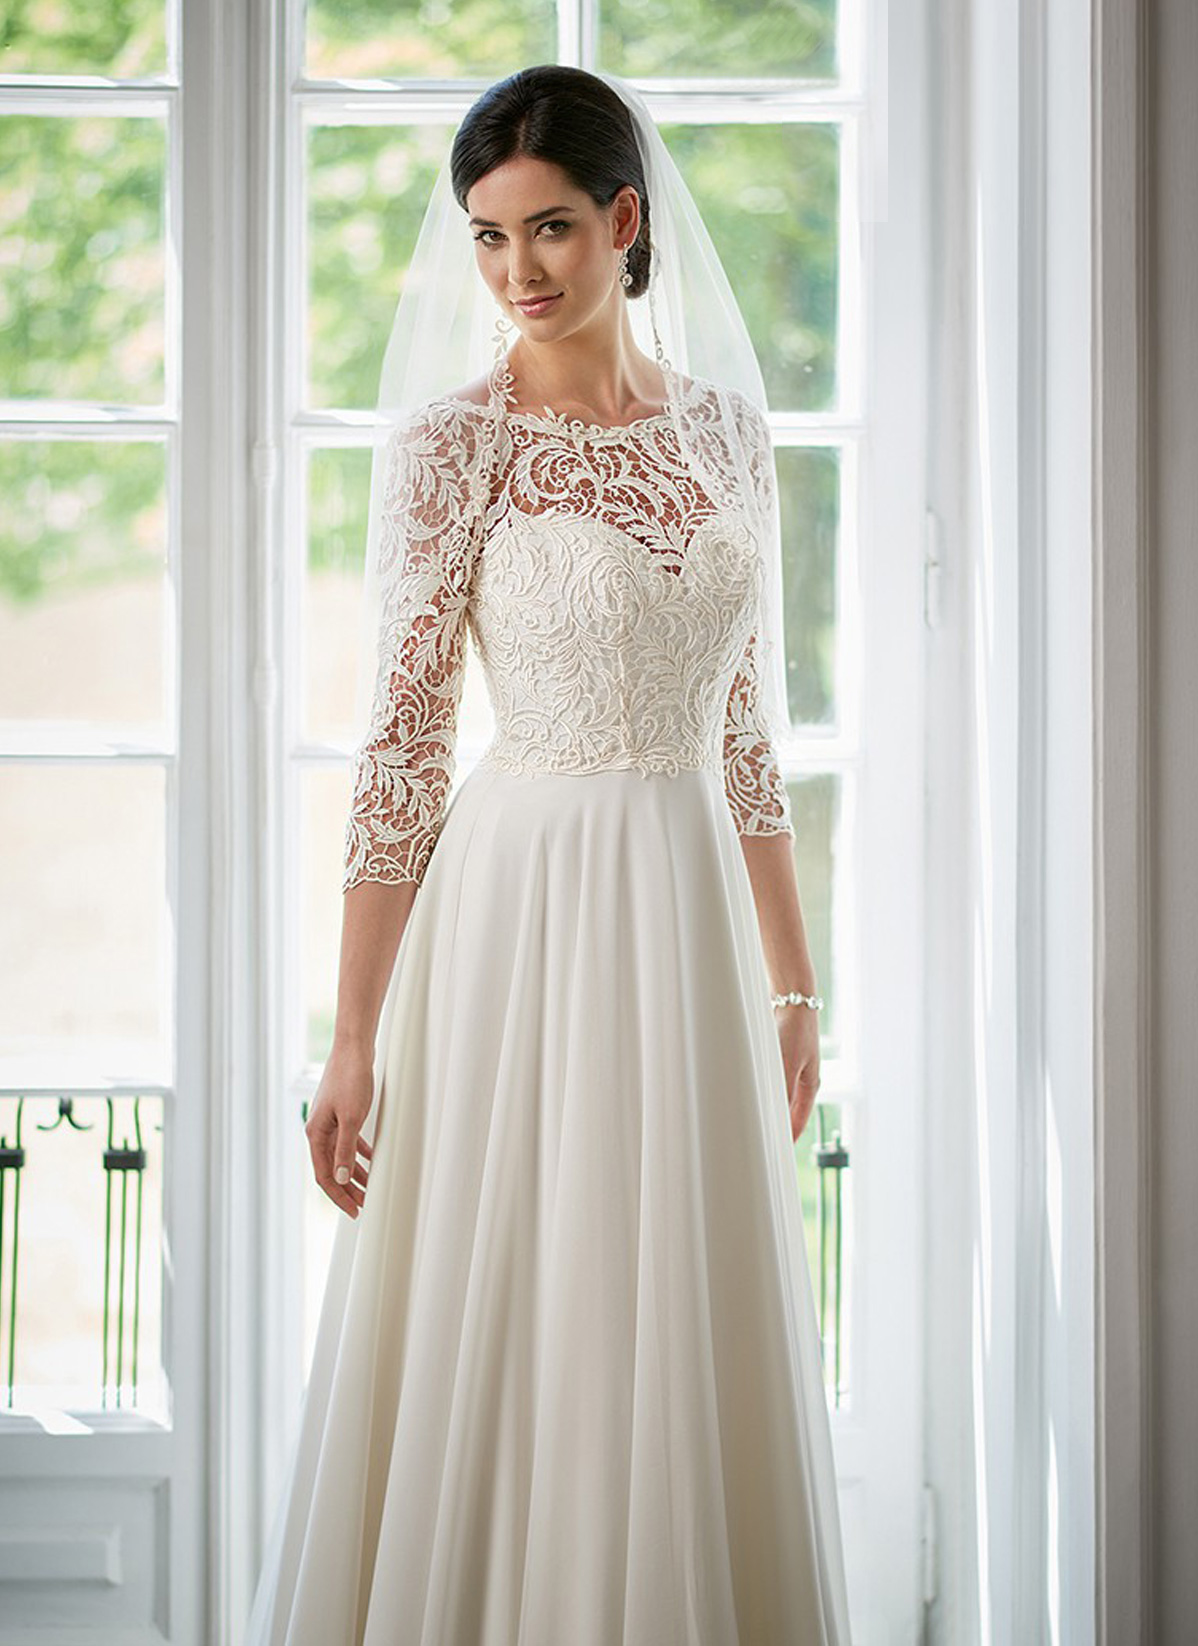 Herm&#8217;s Bridal <br> Amata